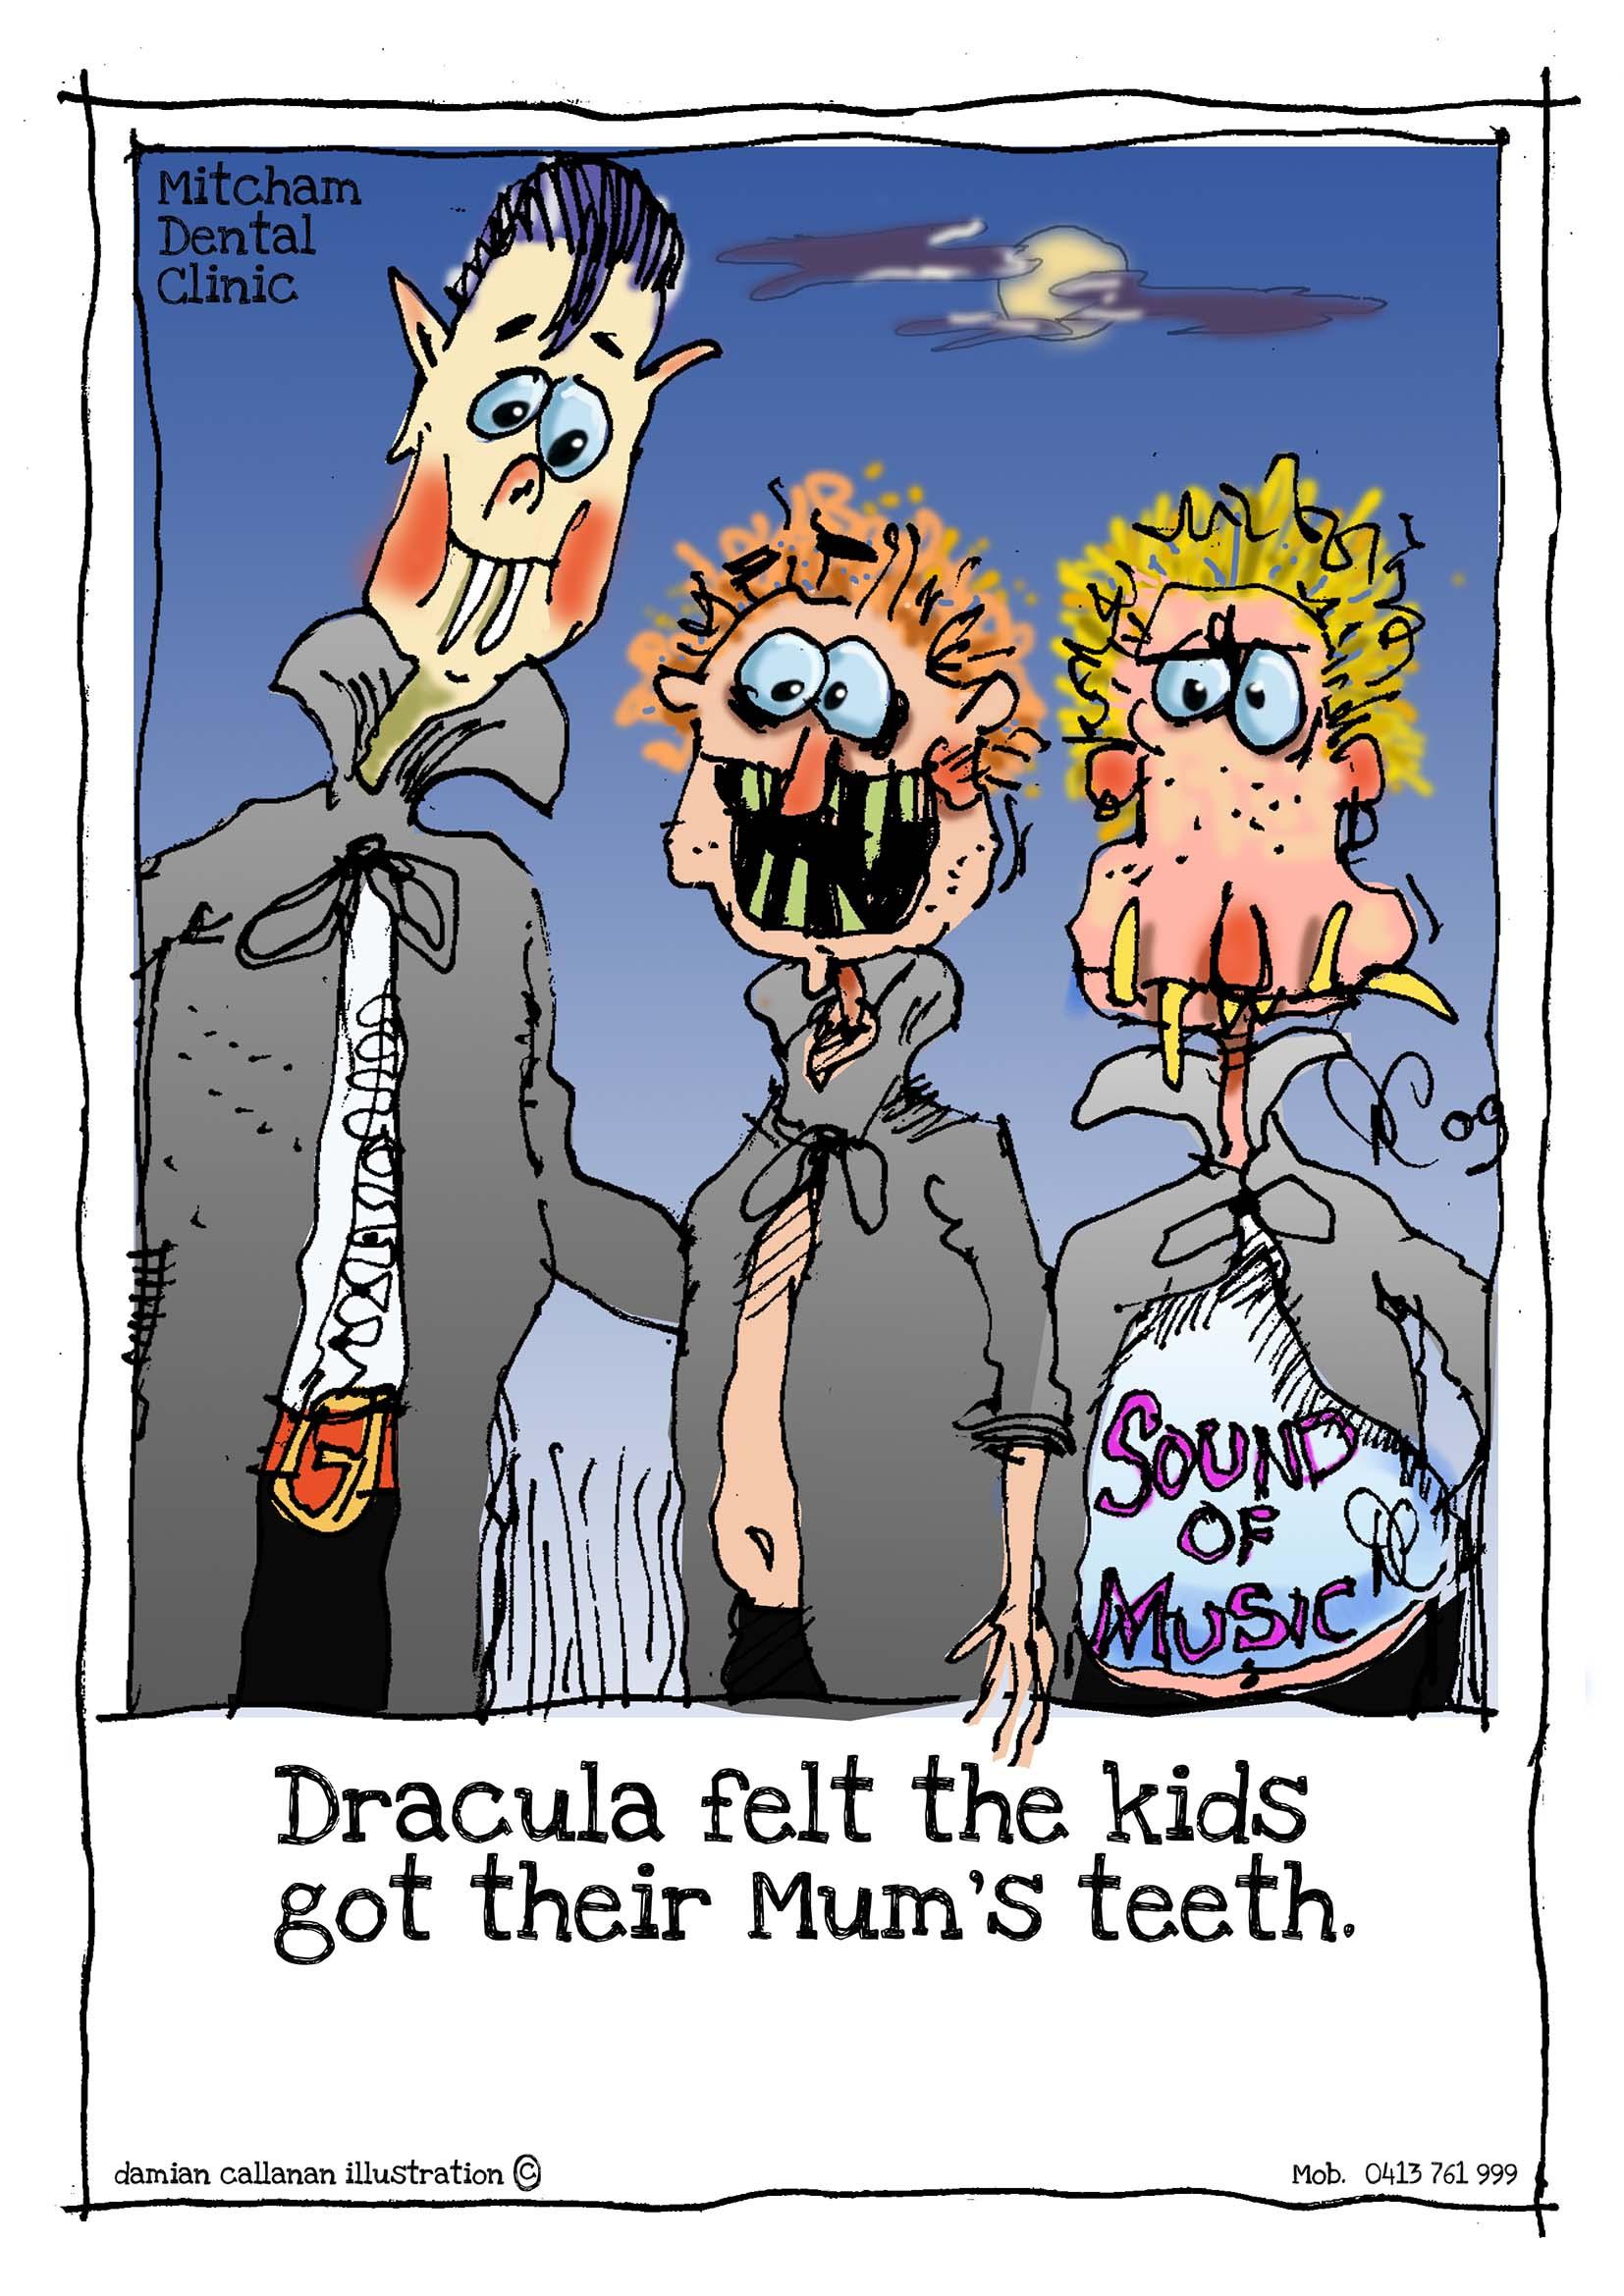 Dracula copy-Reduded.jpg